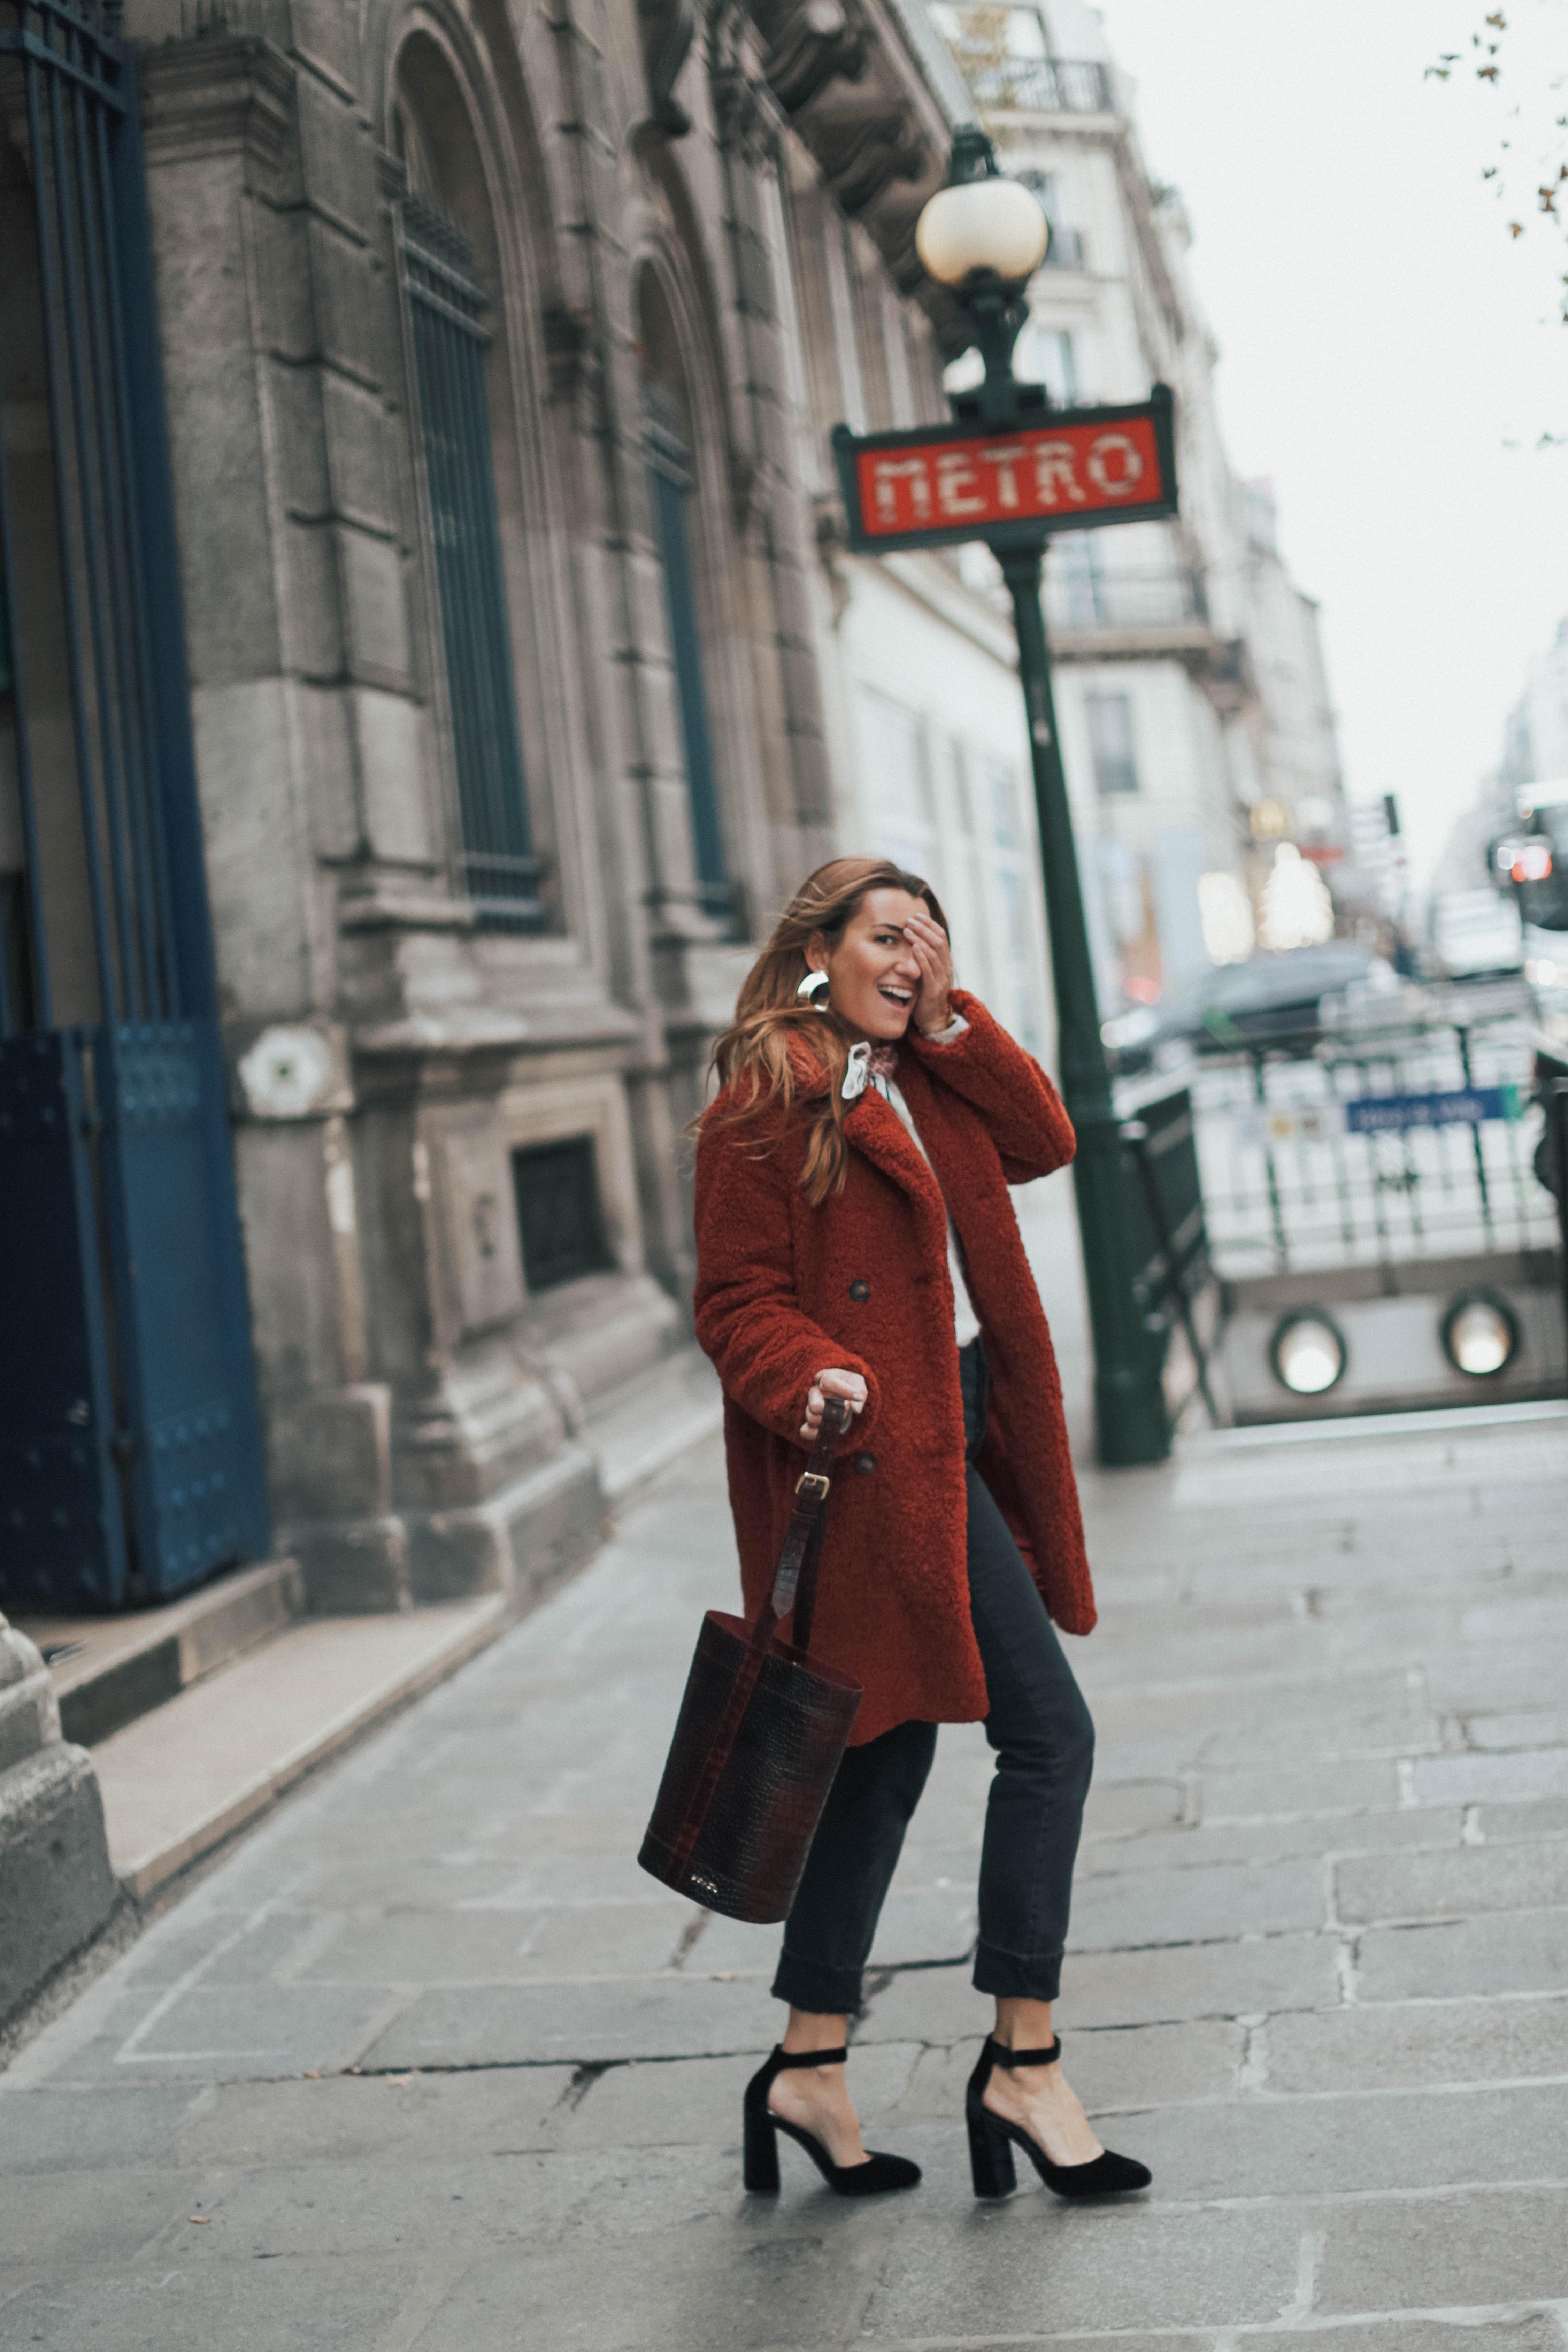 b a r t a b a c blogger coat pants shoes bag sweater scarf high heel pumps teddy bear coat winter outfits